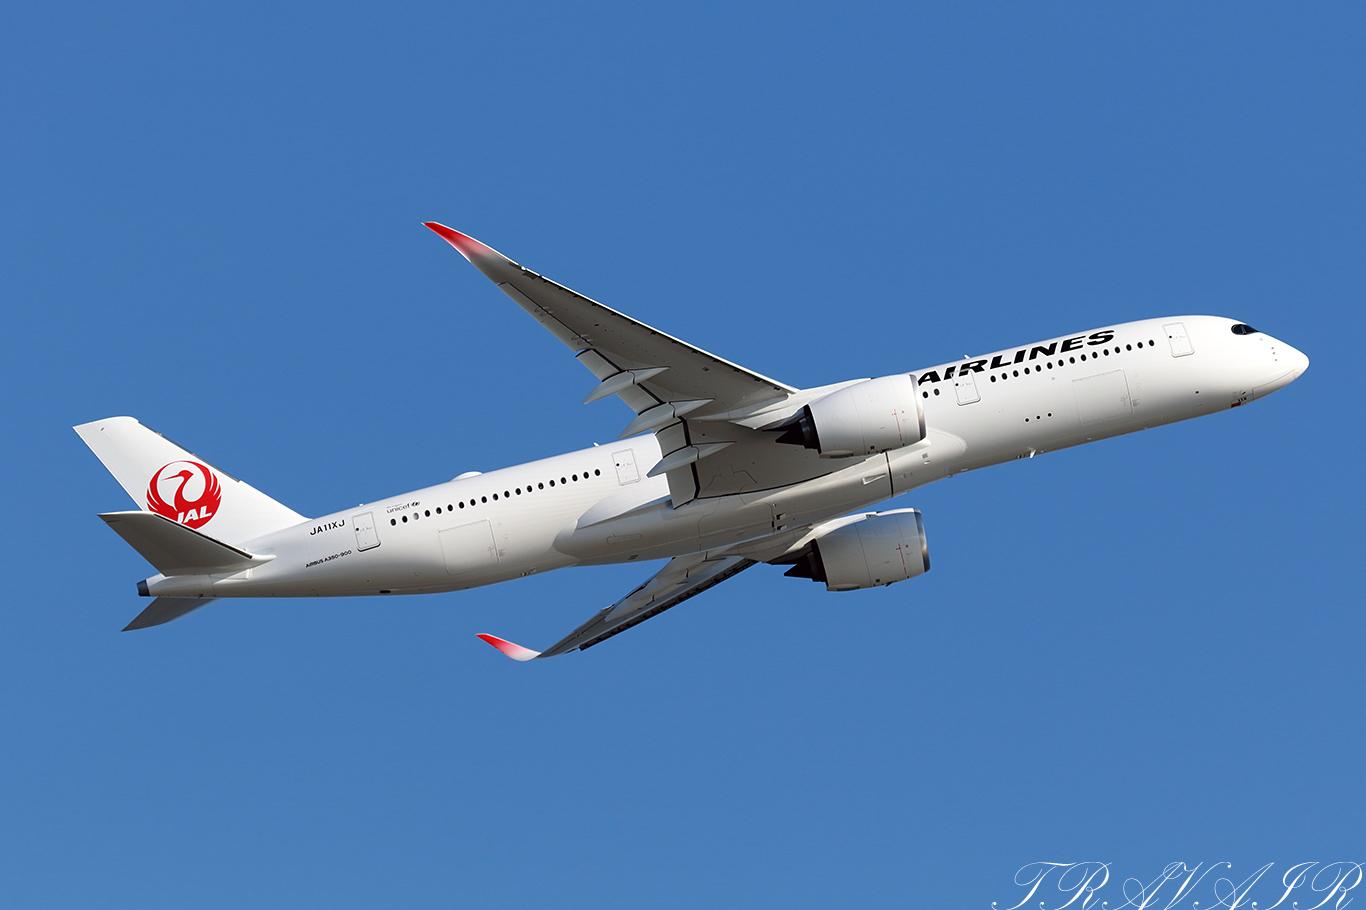 JL/JAL/日本航空 JL919 A350-900 JA11XJ